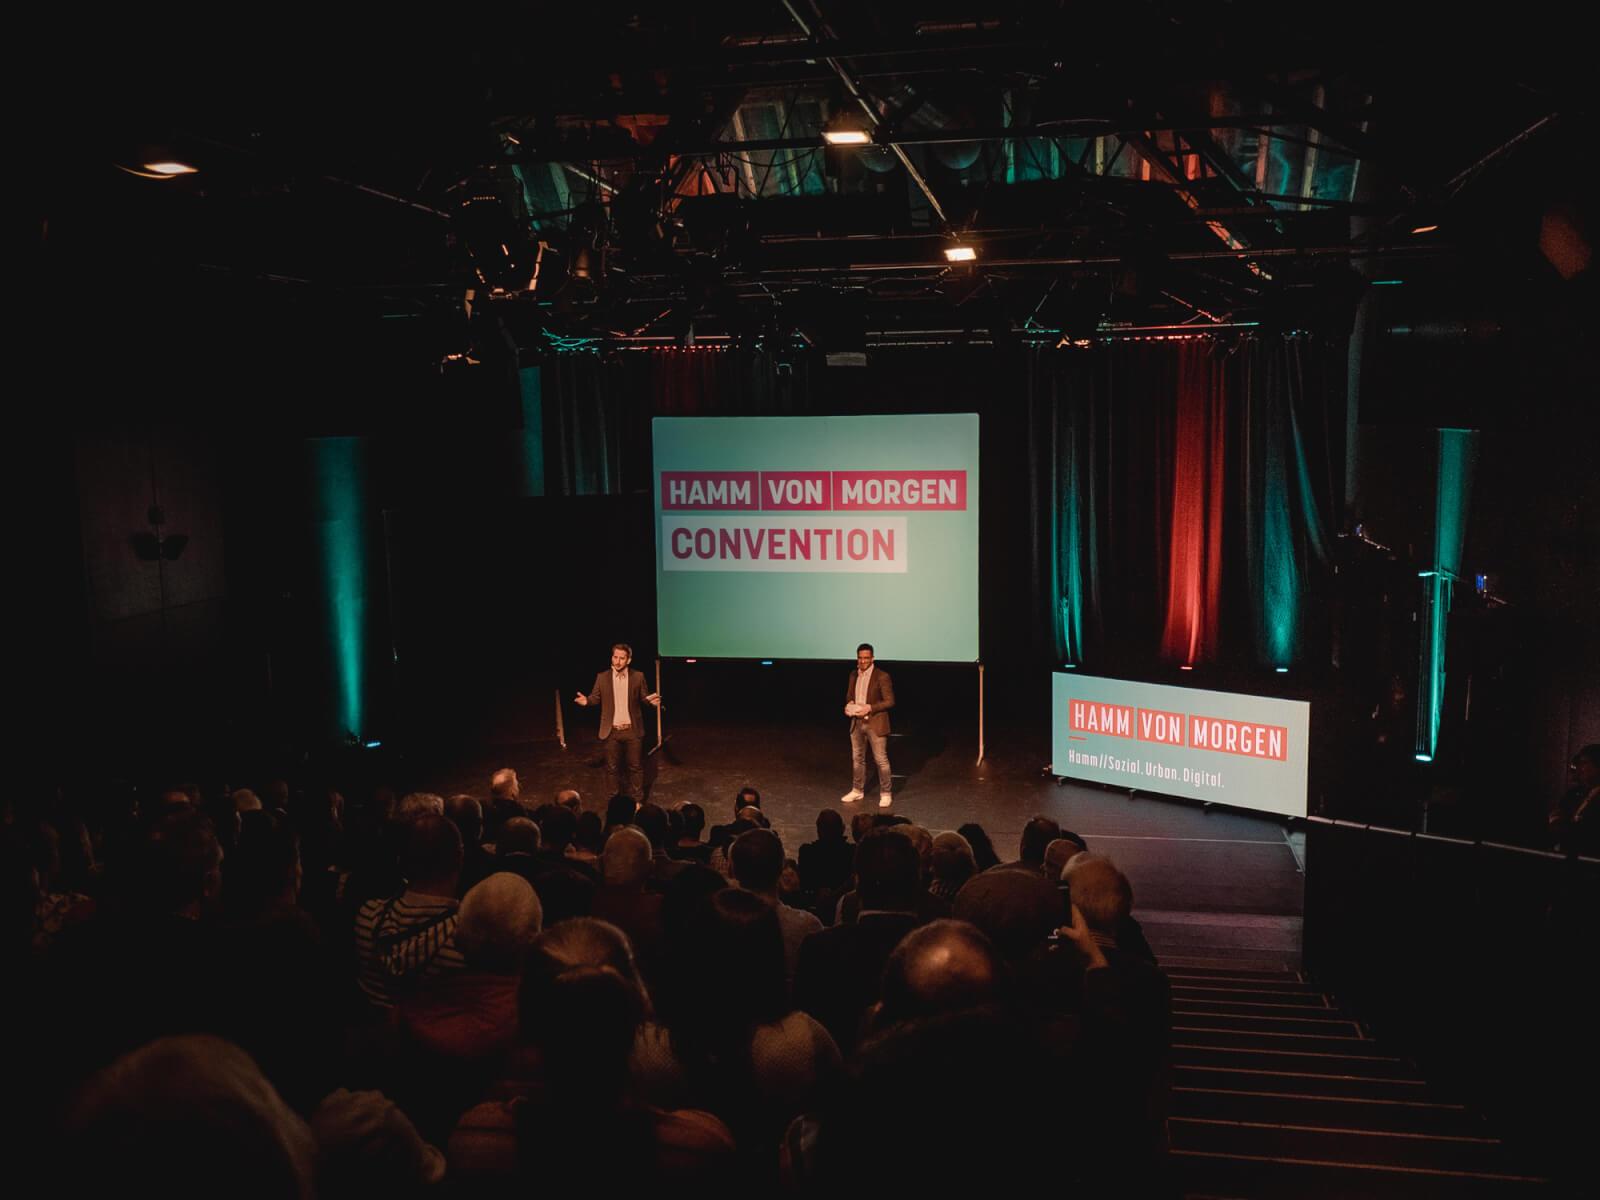 Convention//Fotogallerie